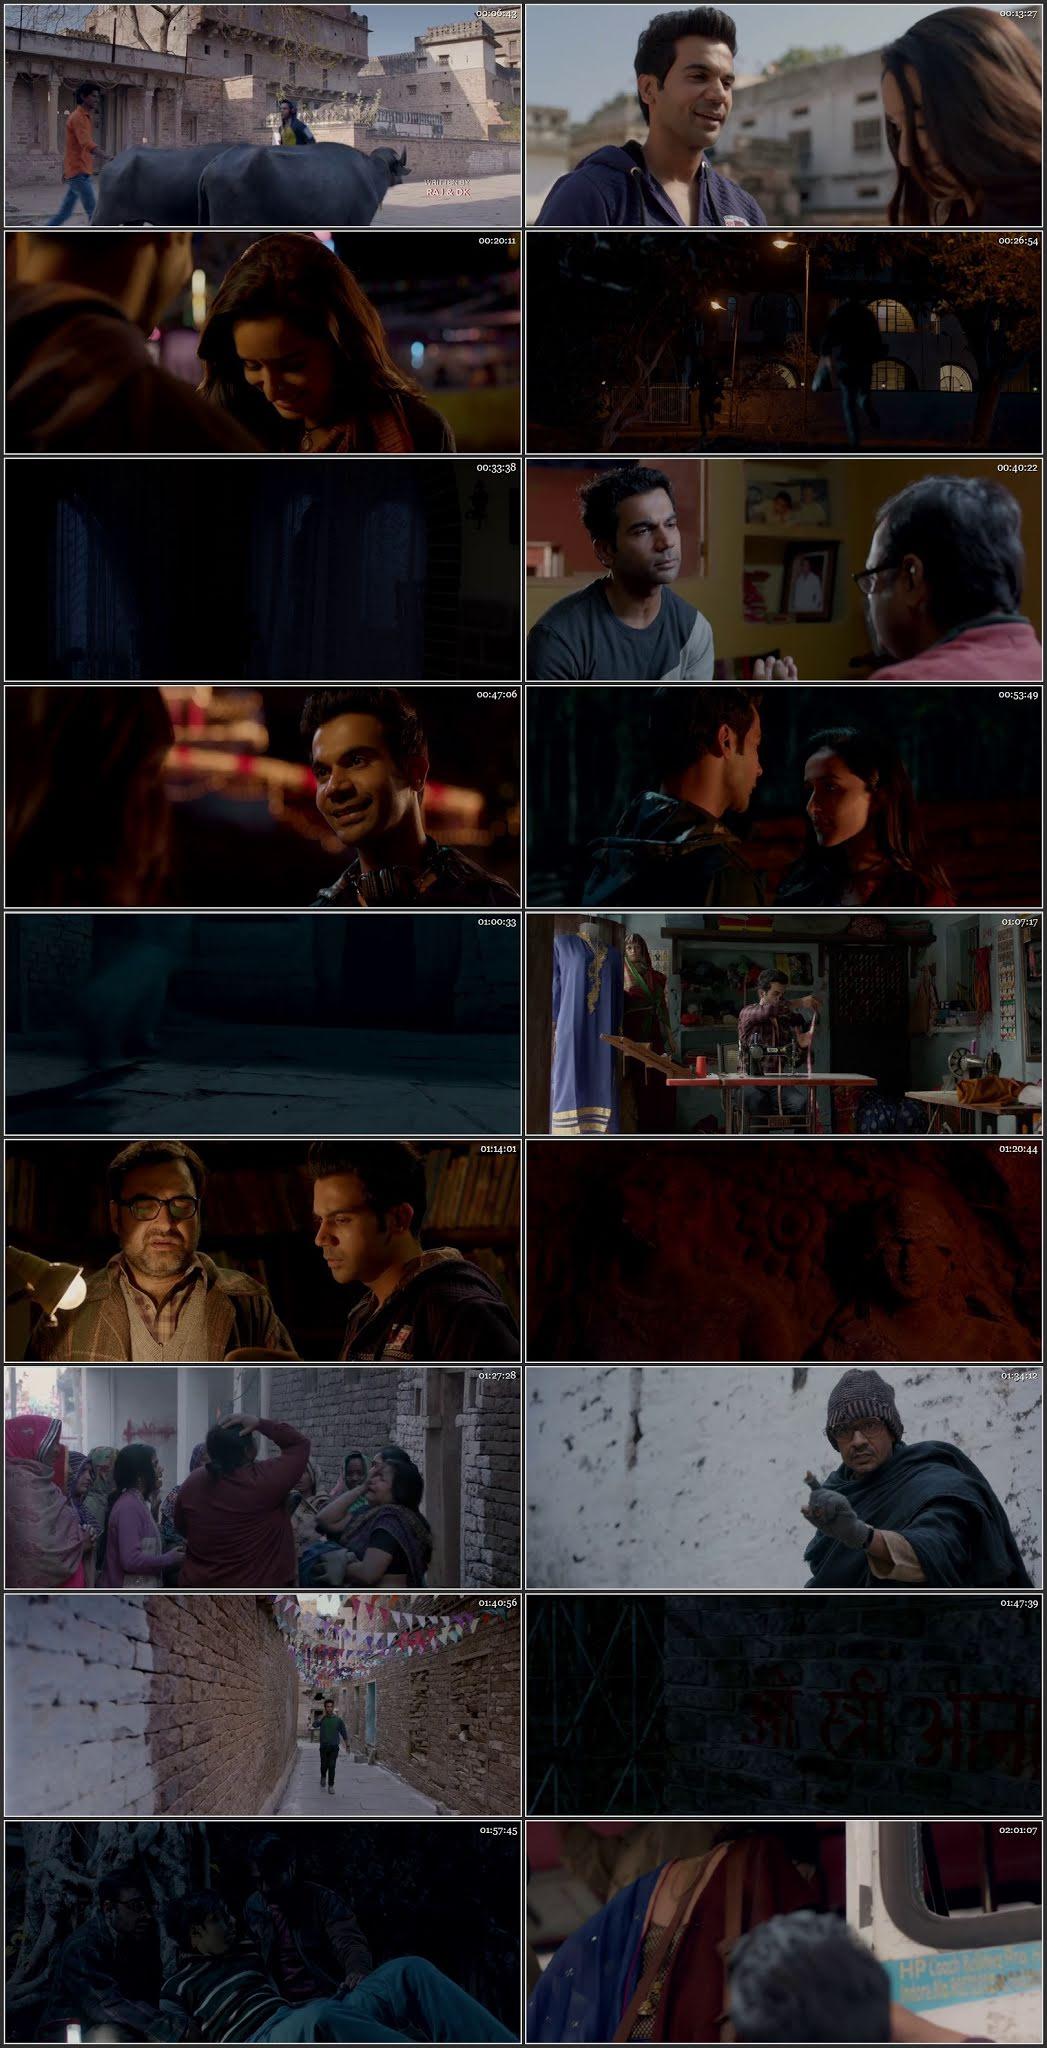 Stree%2B%25282018%2529%2B1.28GB%2B720P%2BHDRip%2BHindi%2BMovie Watch Online Stree 2018 Full Hindi Movie Free Download HD 720P ESubs